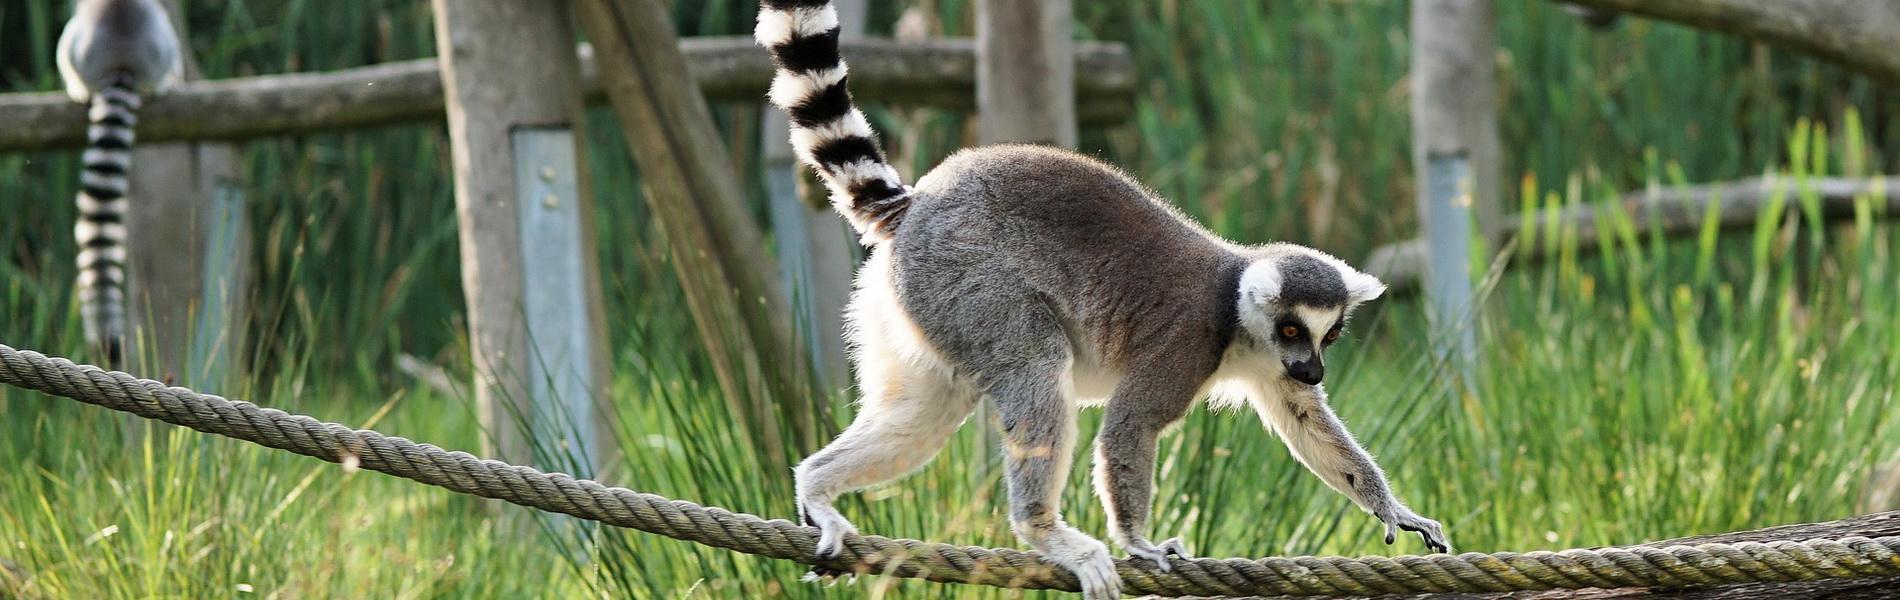 CC0 Creative Commons, Artenschutz, Katta Lemur balanciert auf Seil